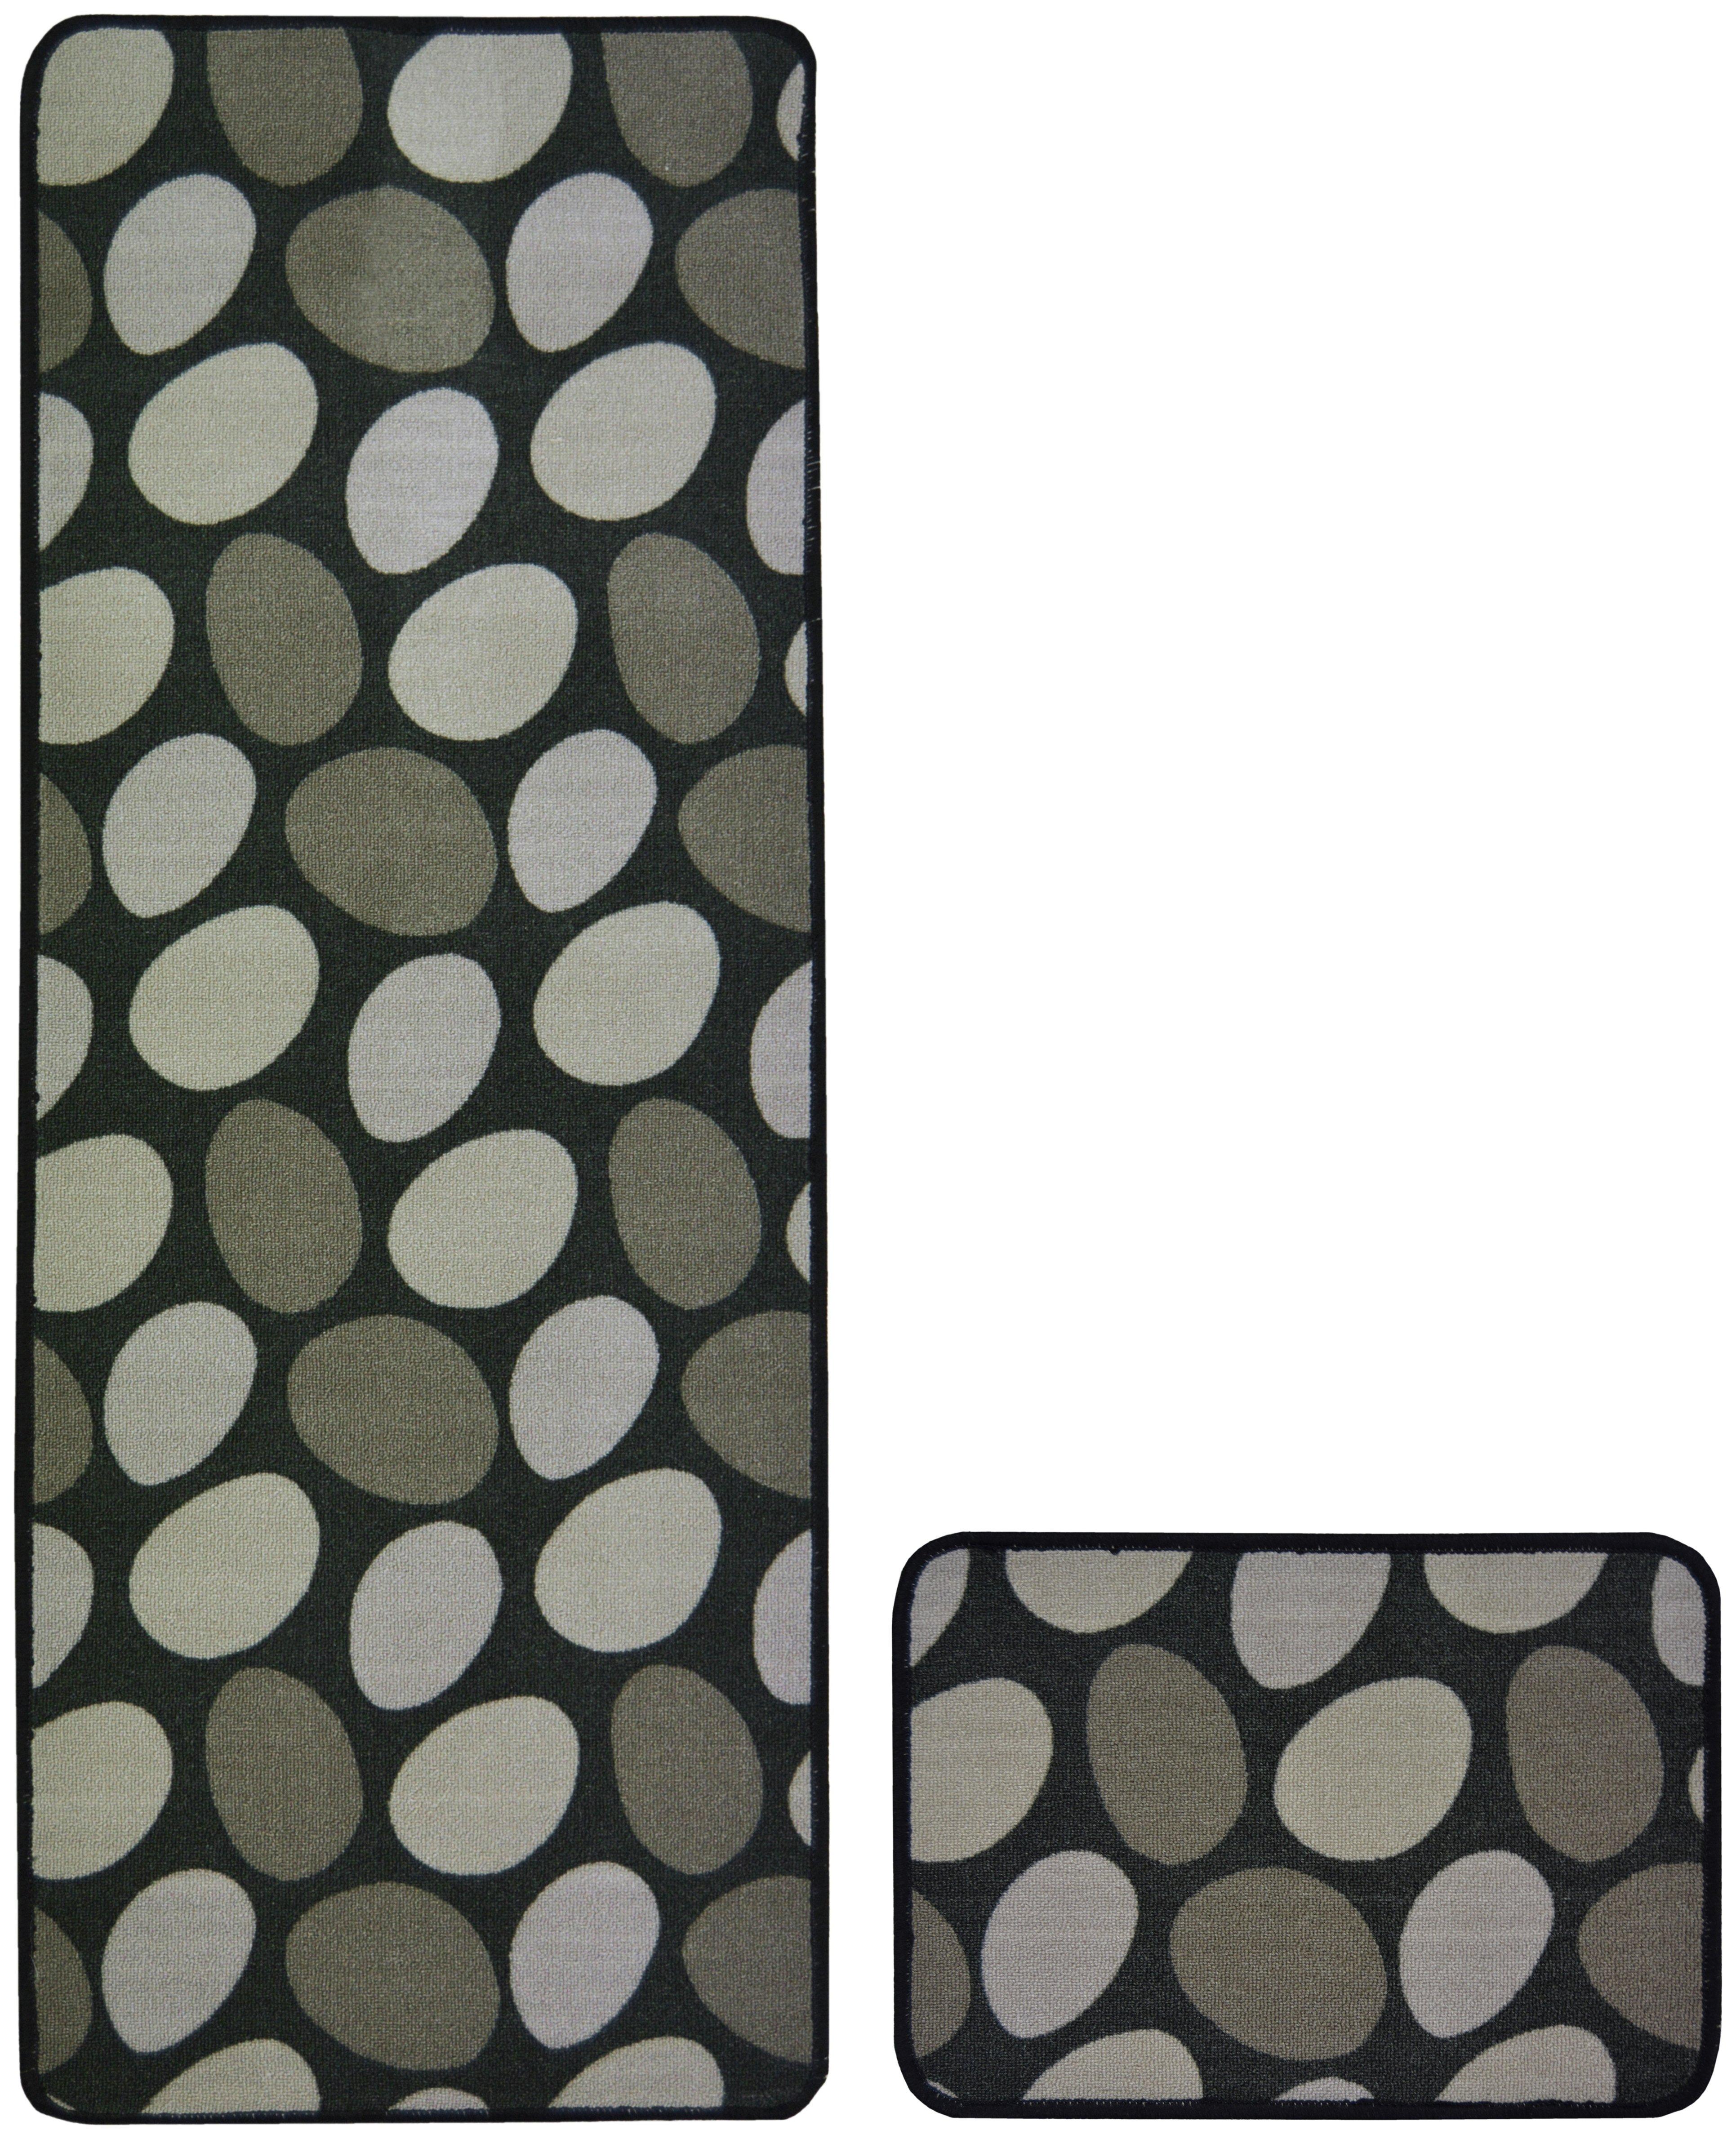 Stepping Stones Runner and Doormat Set 100cm - Black